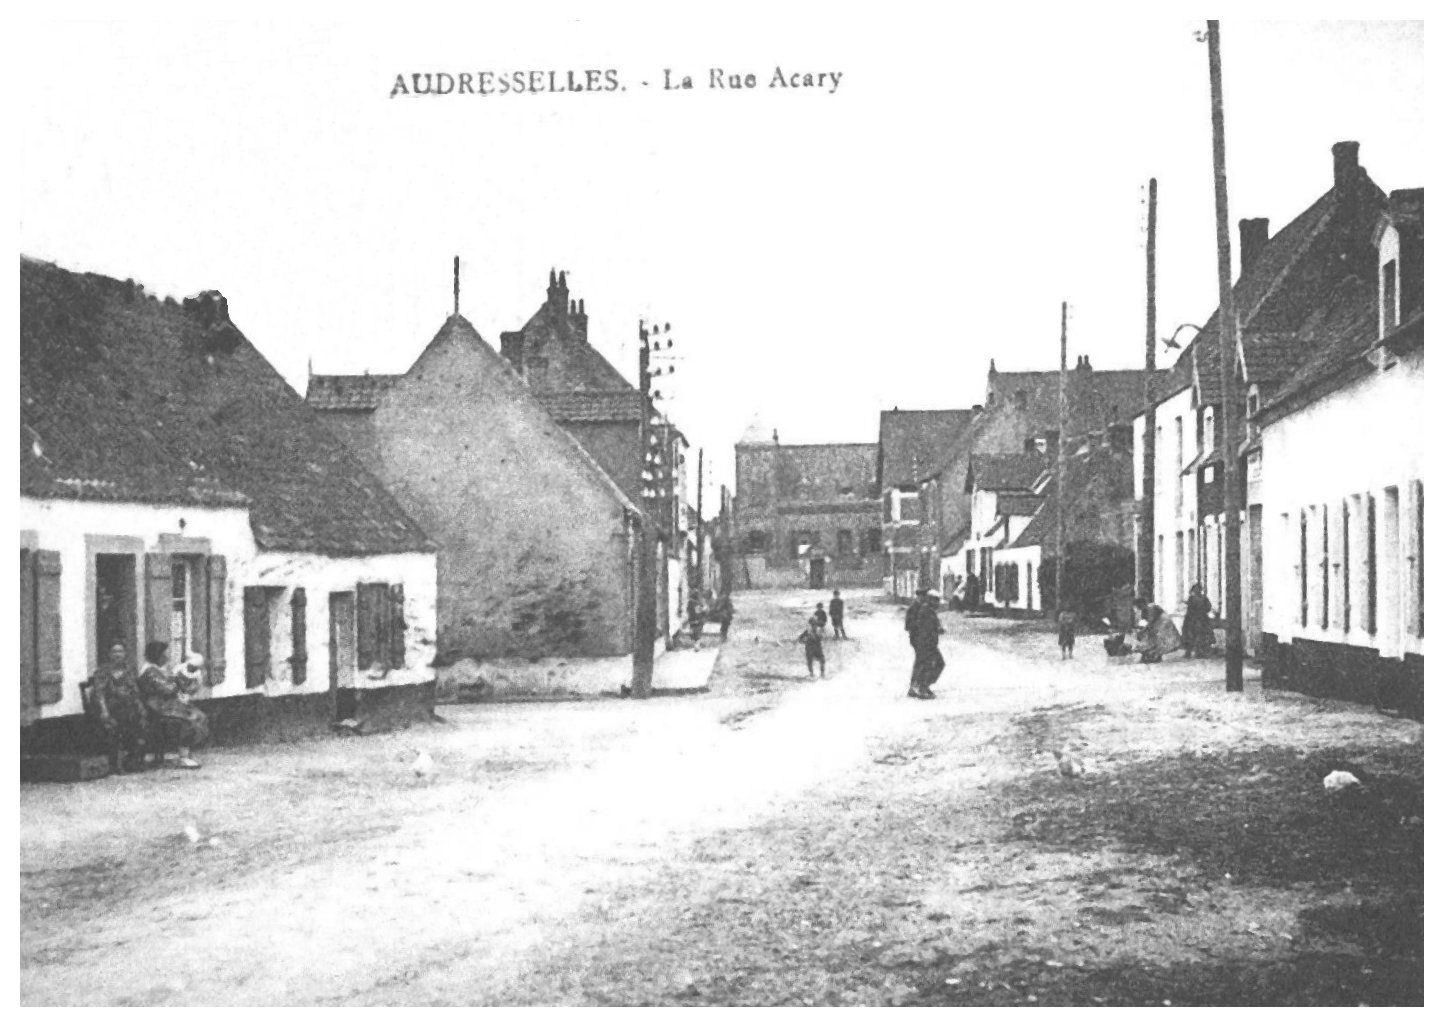 Audresselles - la rue Acary